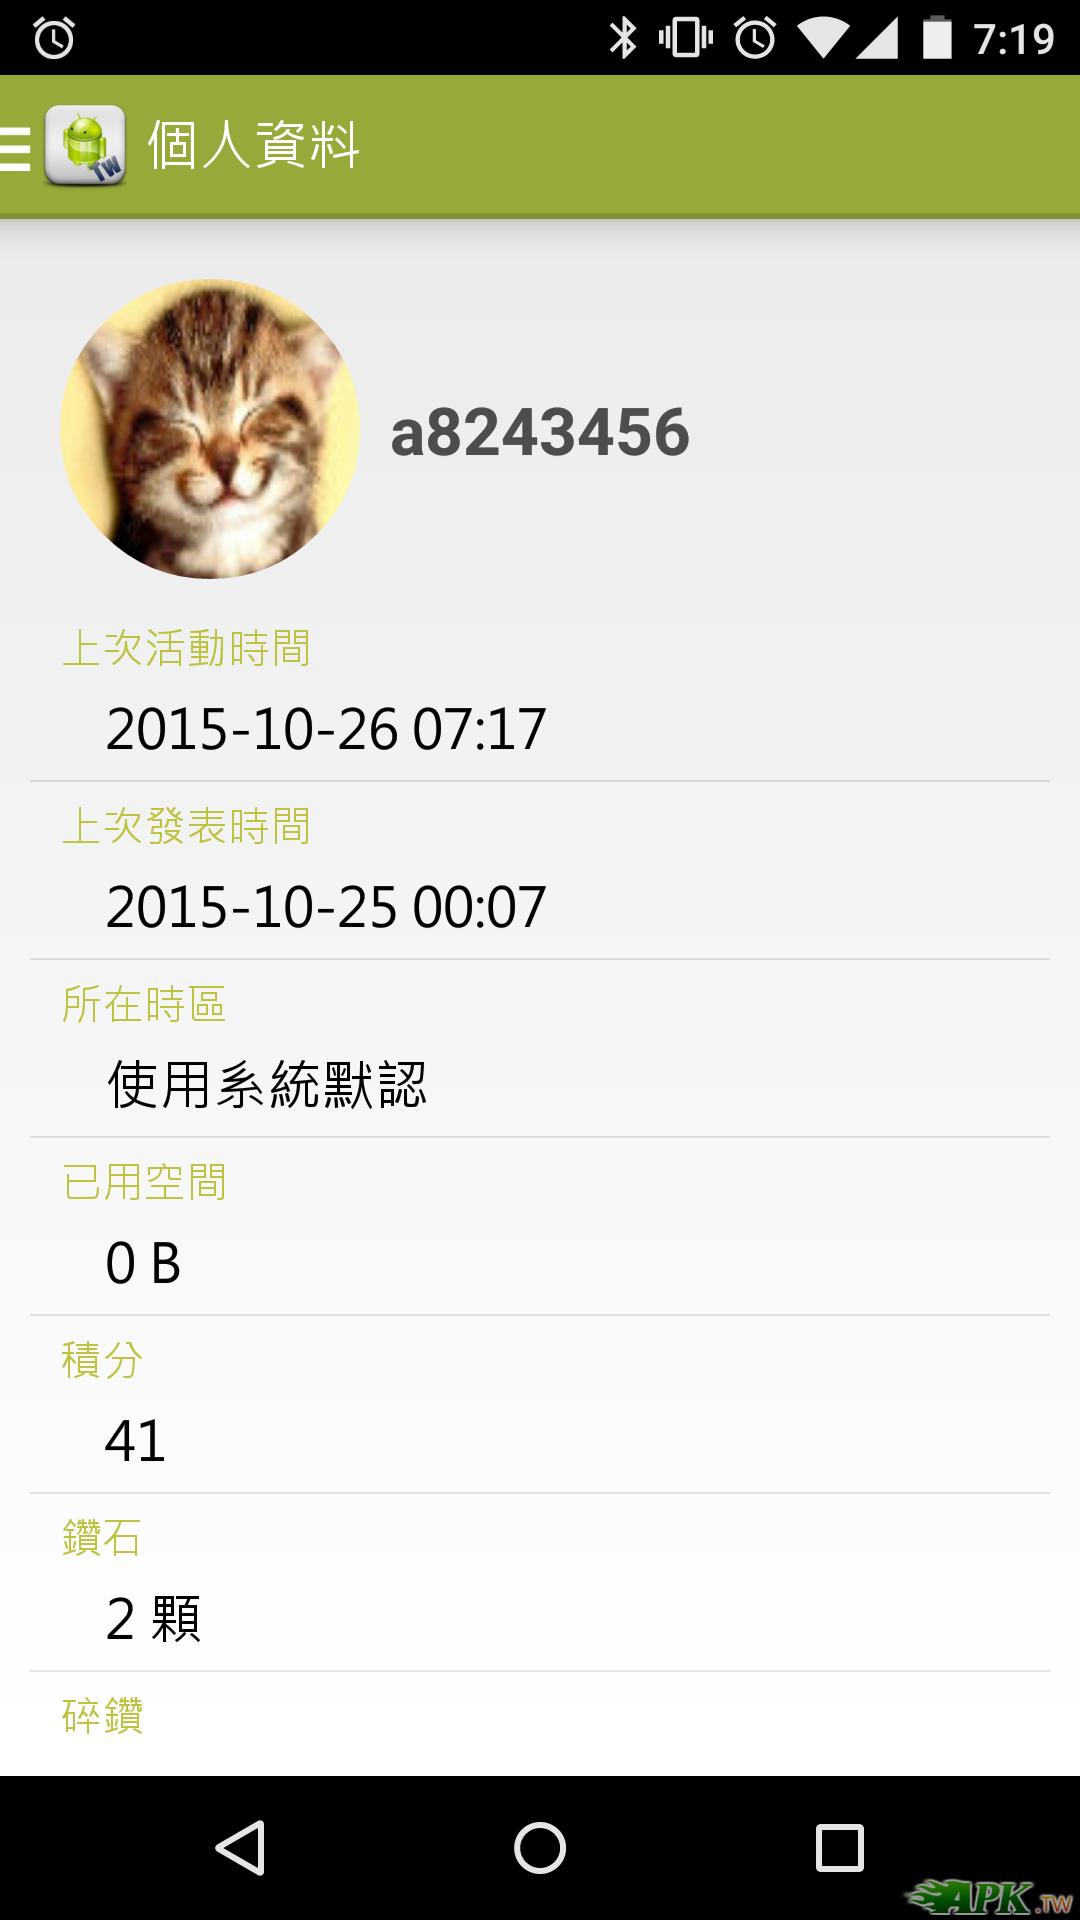 Screenshot_2015-10-26-07-19-46.png